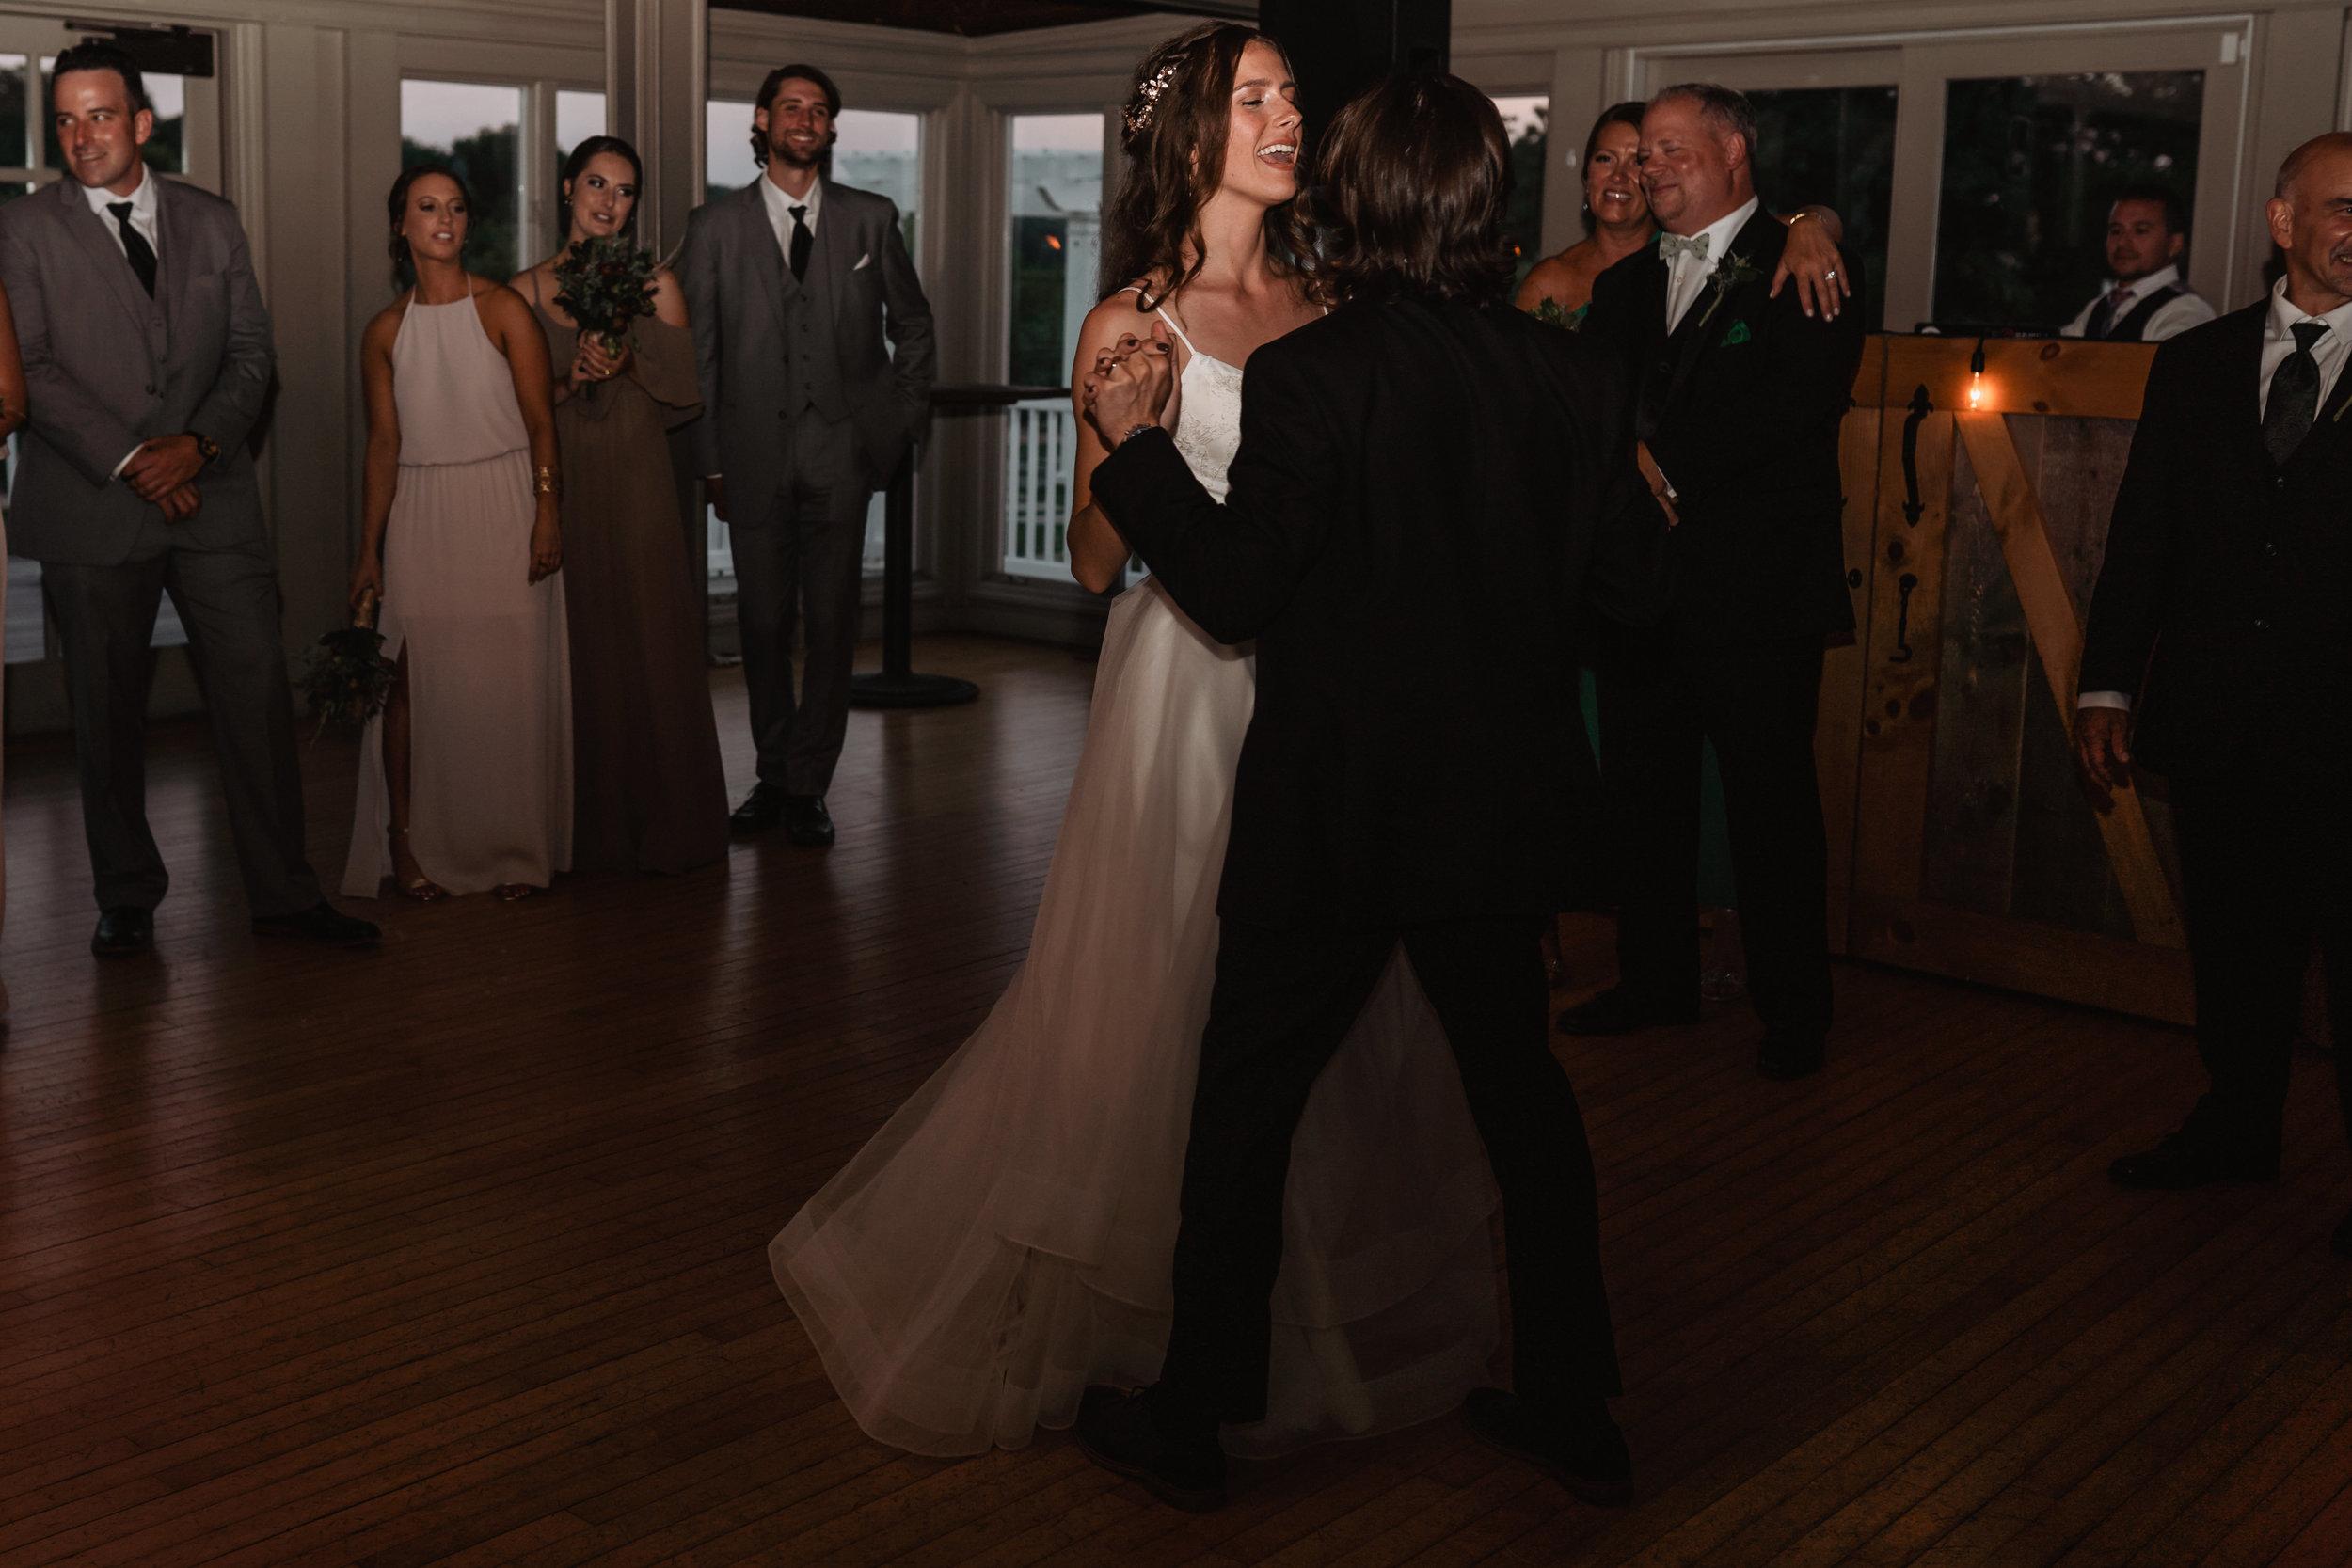 JJP_Emily&Joey_Summer_Old Field Club Wedding_54.jpg